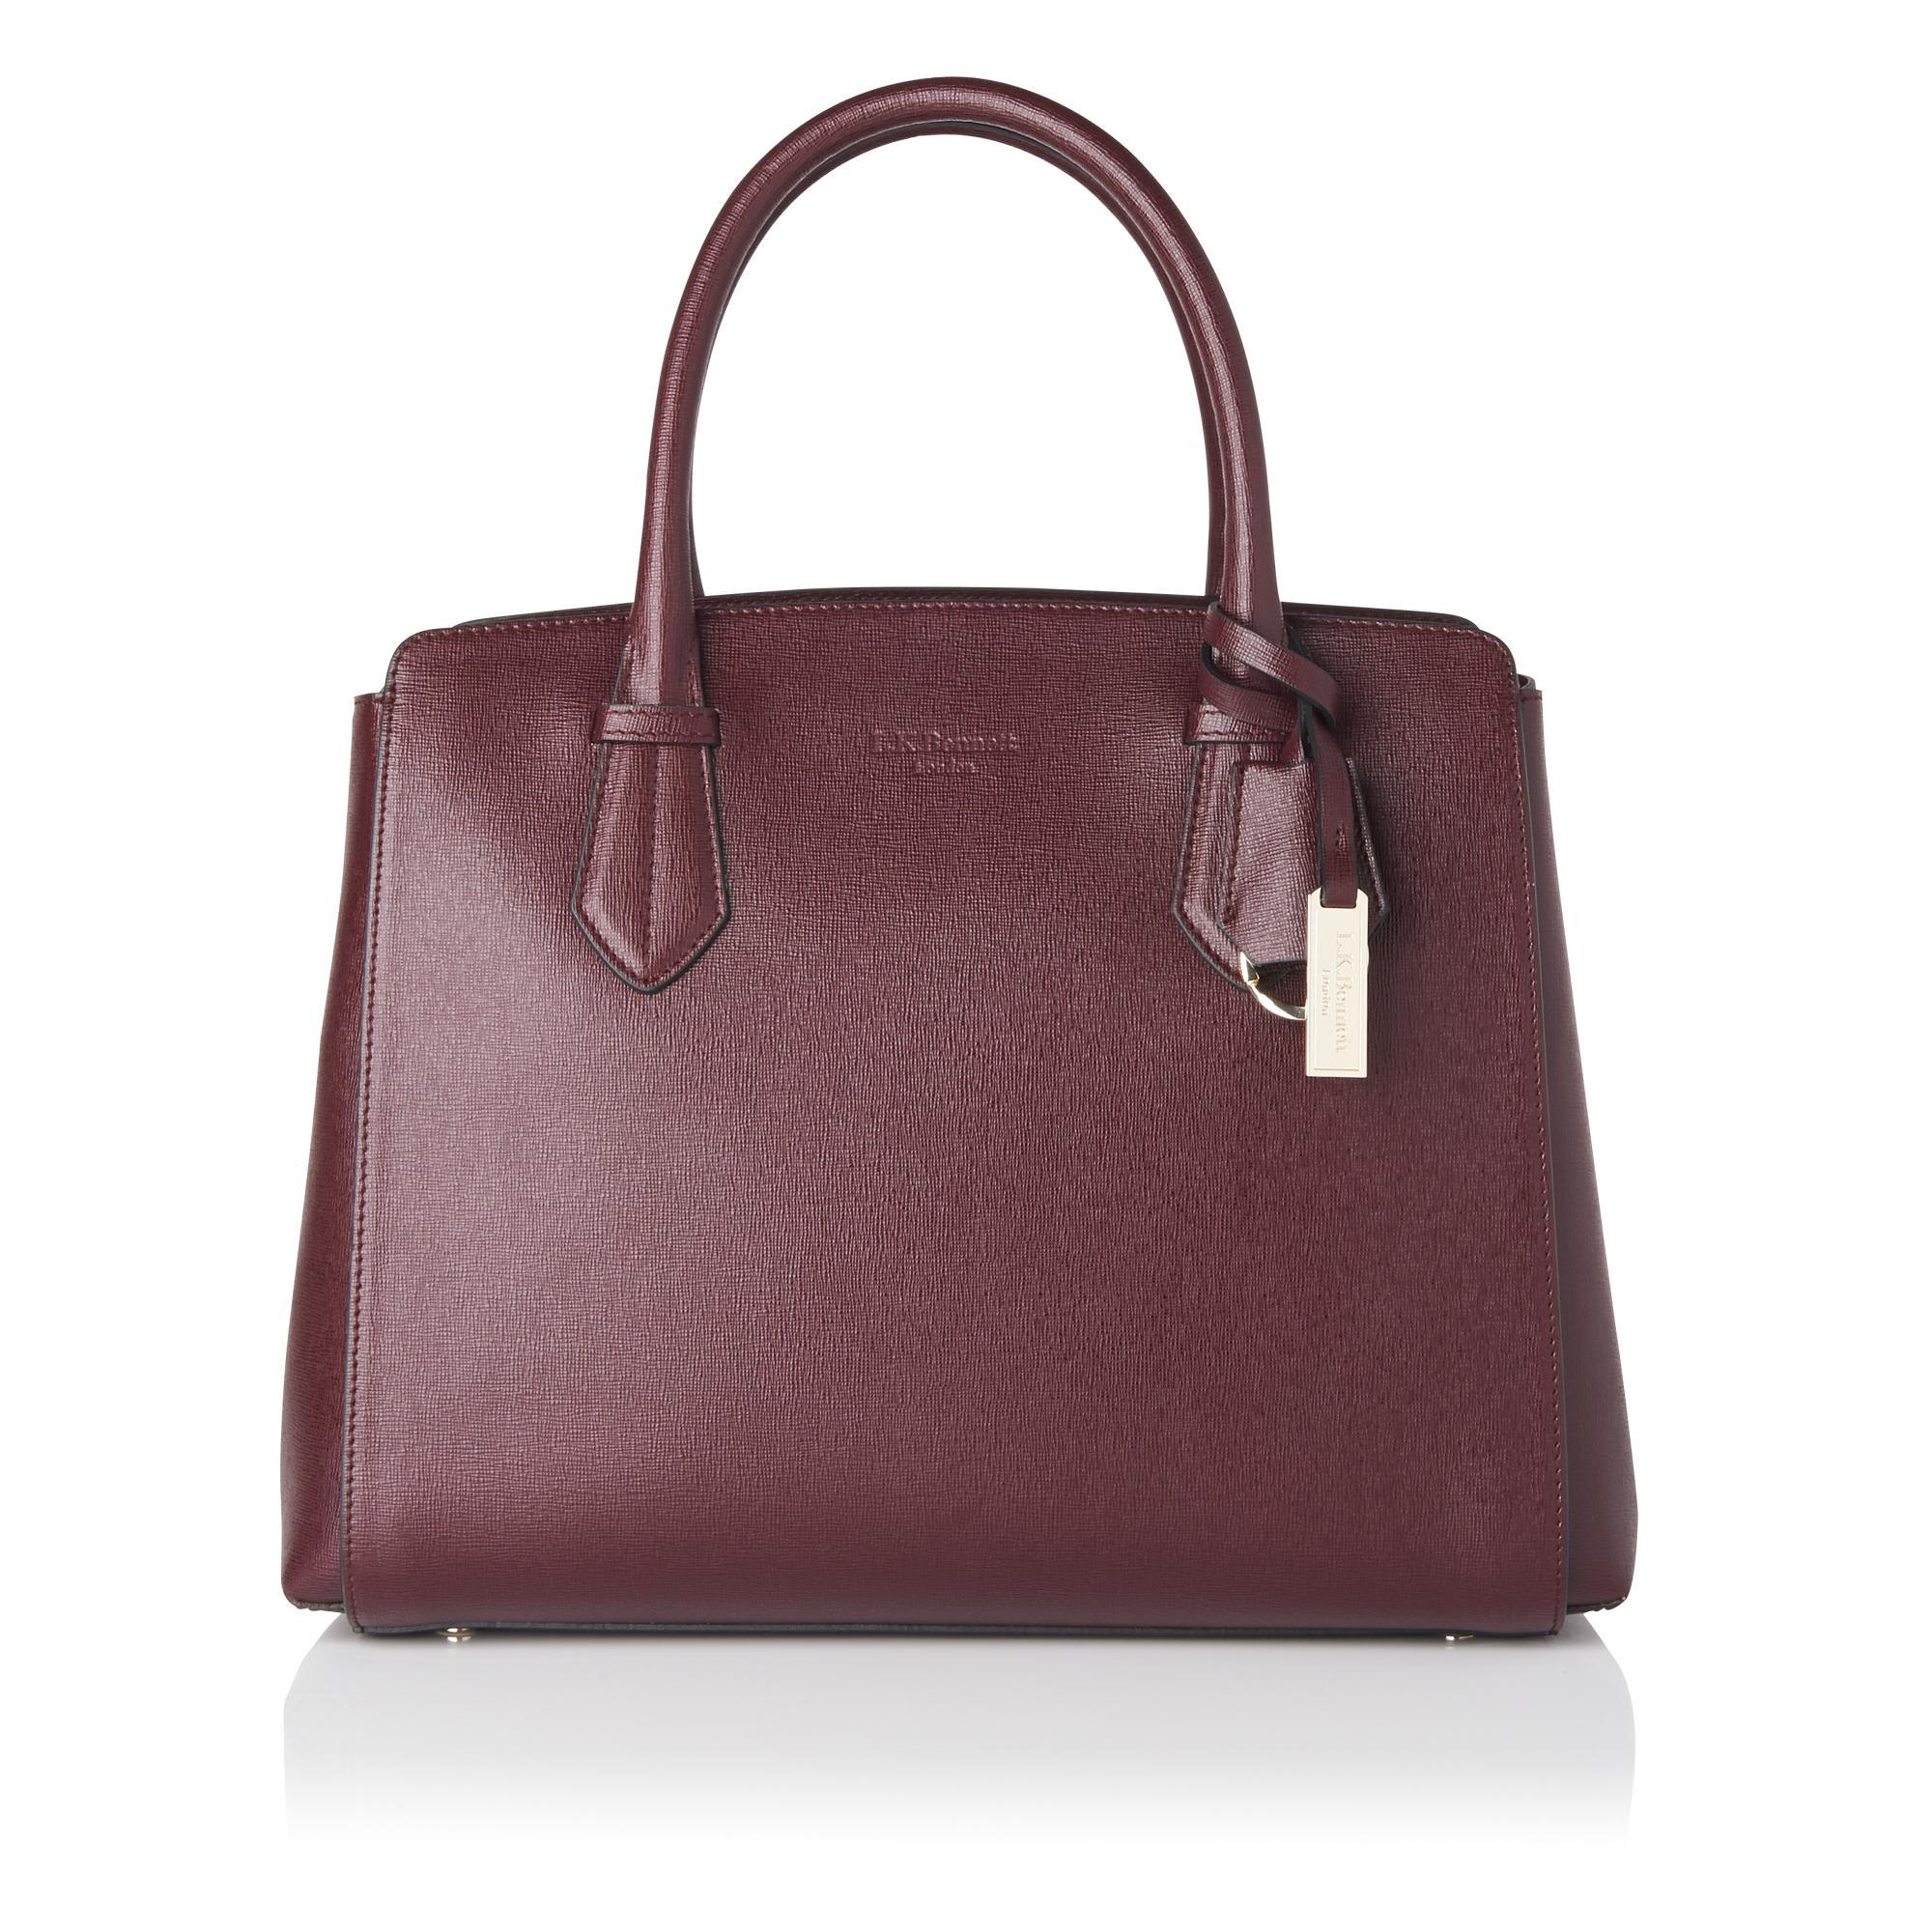 Catrina Oxblood Tote Bag